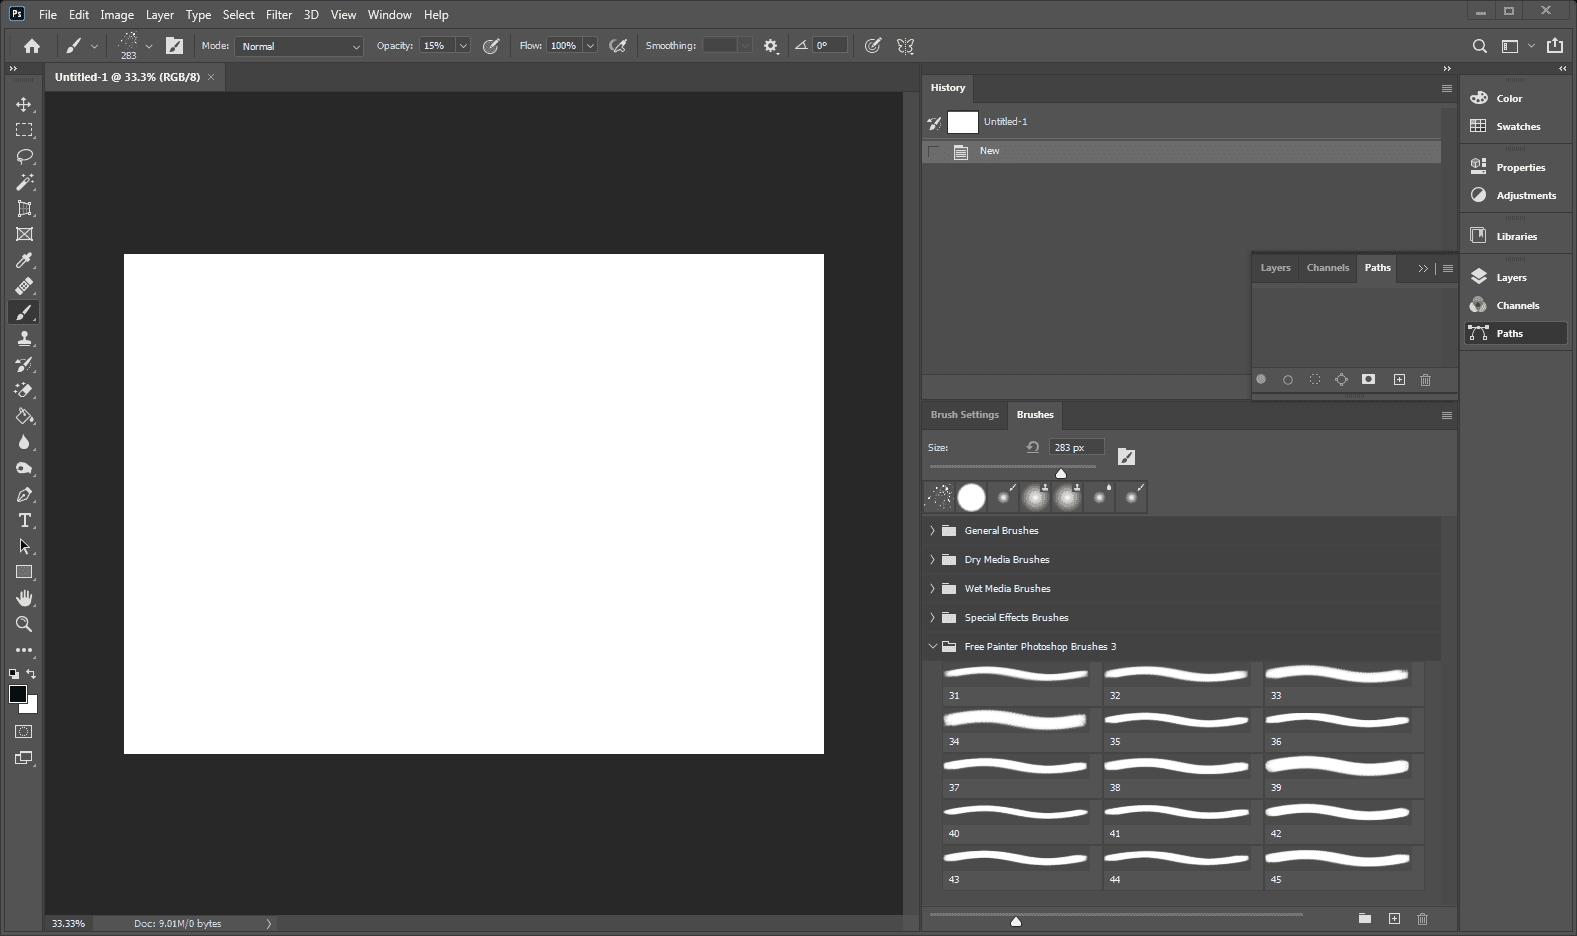 Photoshop with new brushes